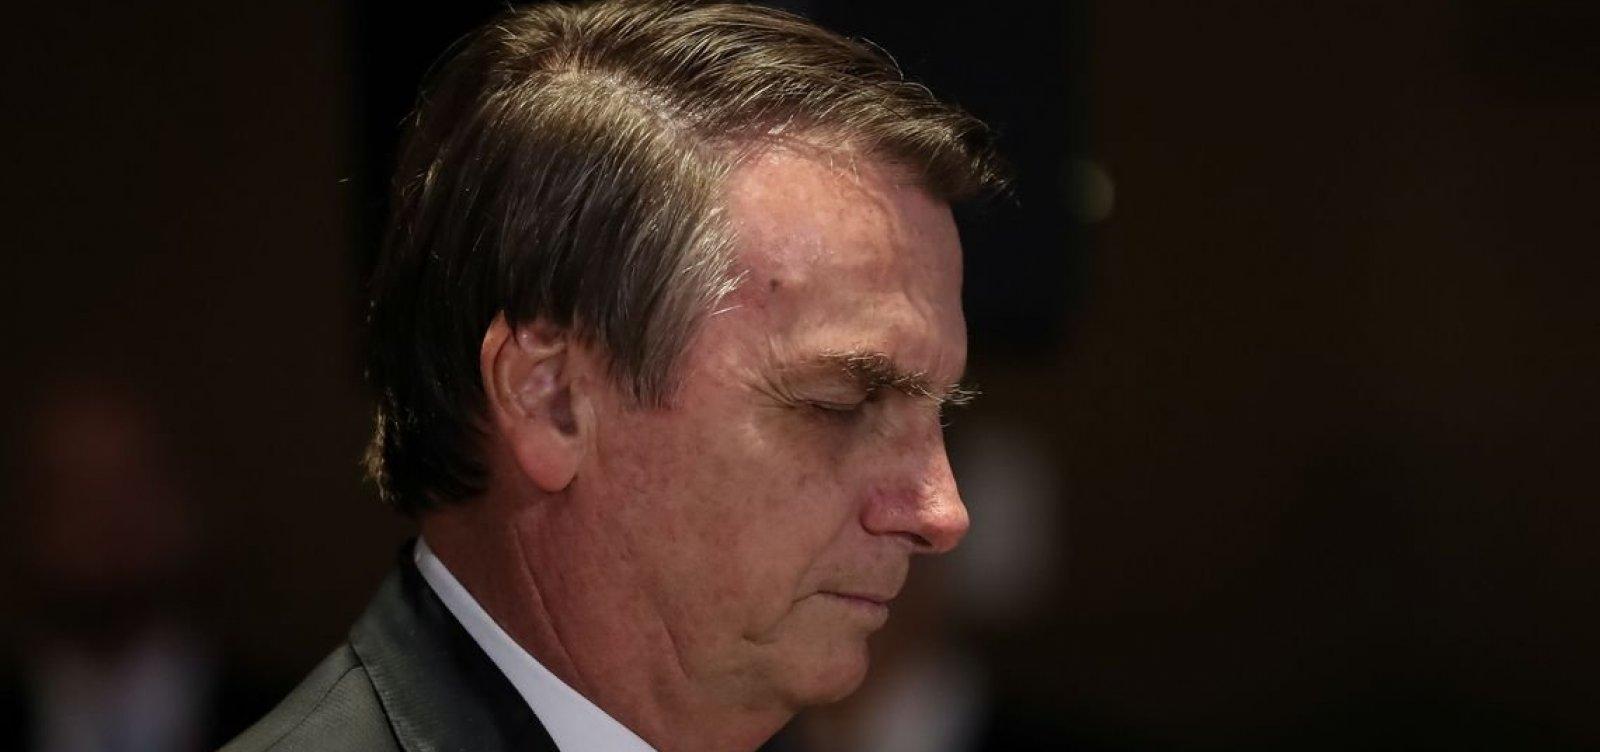 [Presidente de Israel critica fala de Bolsonaro sobre Holocausto]